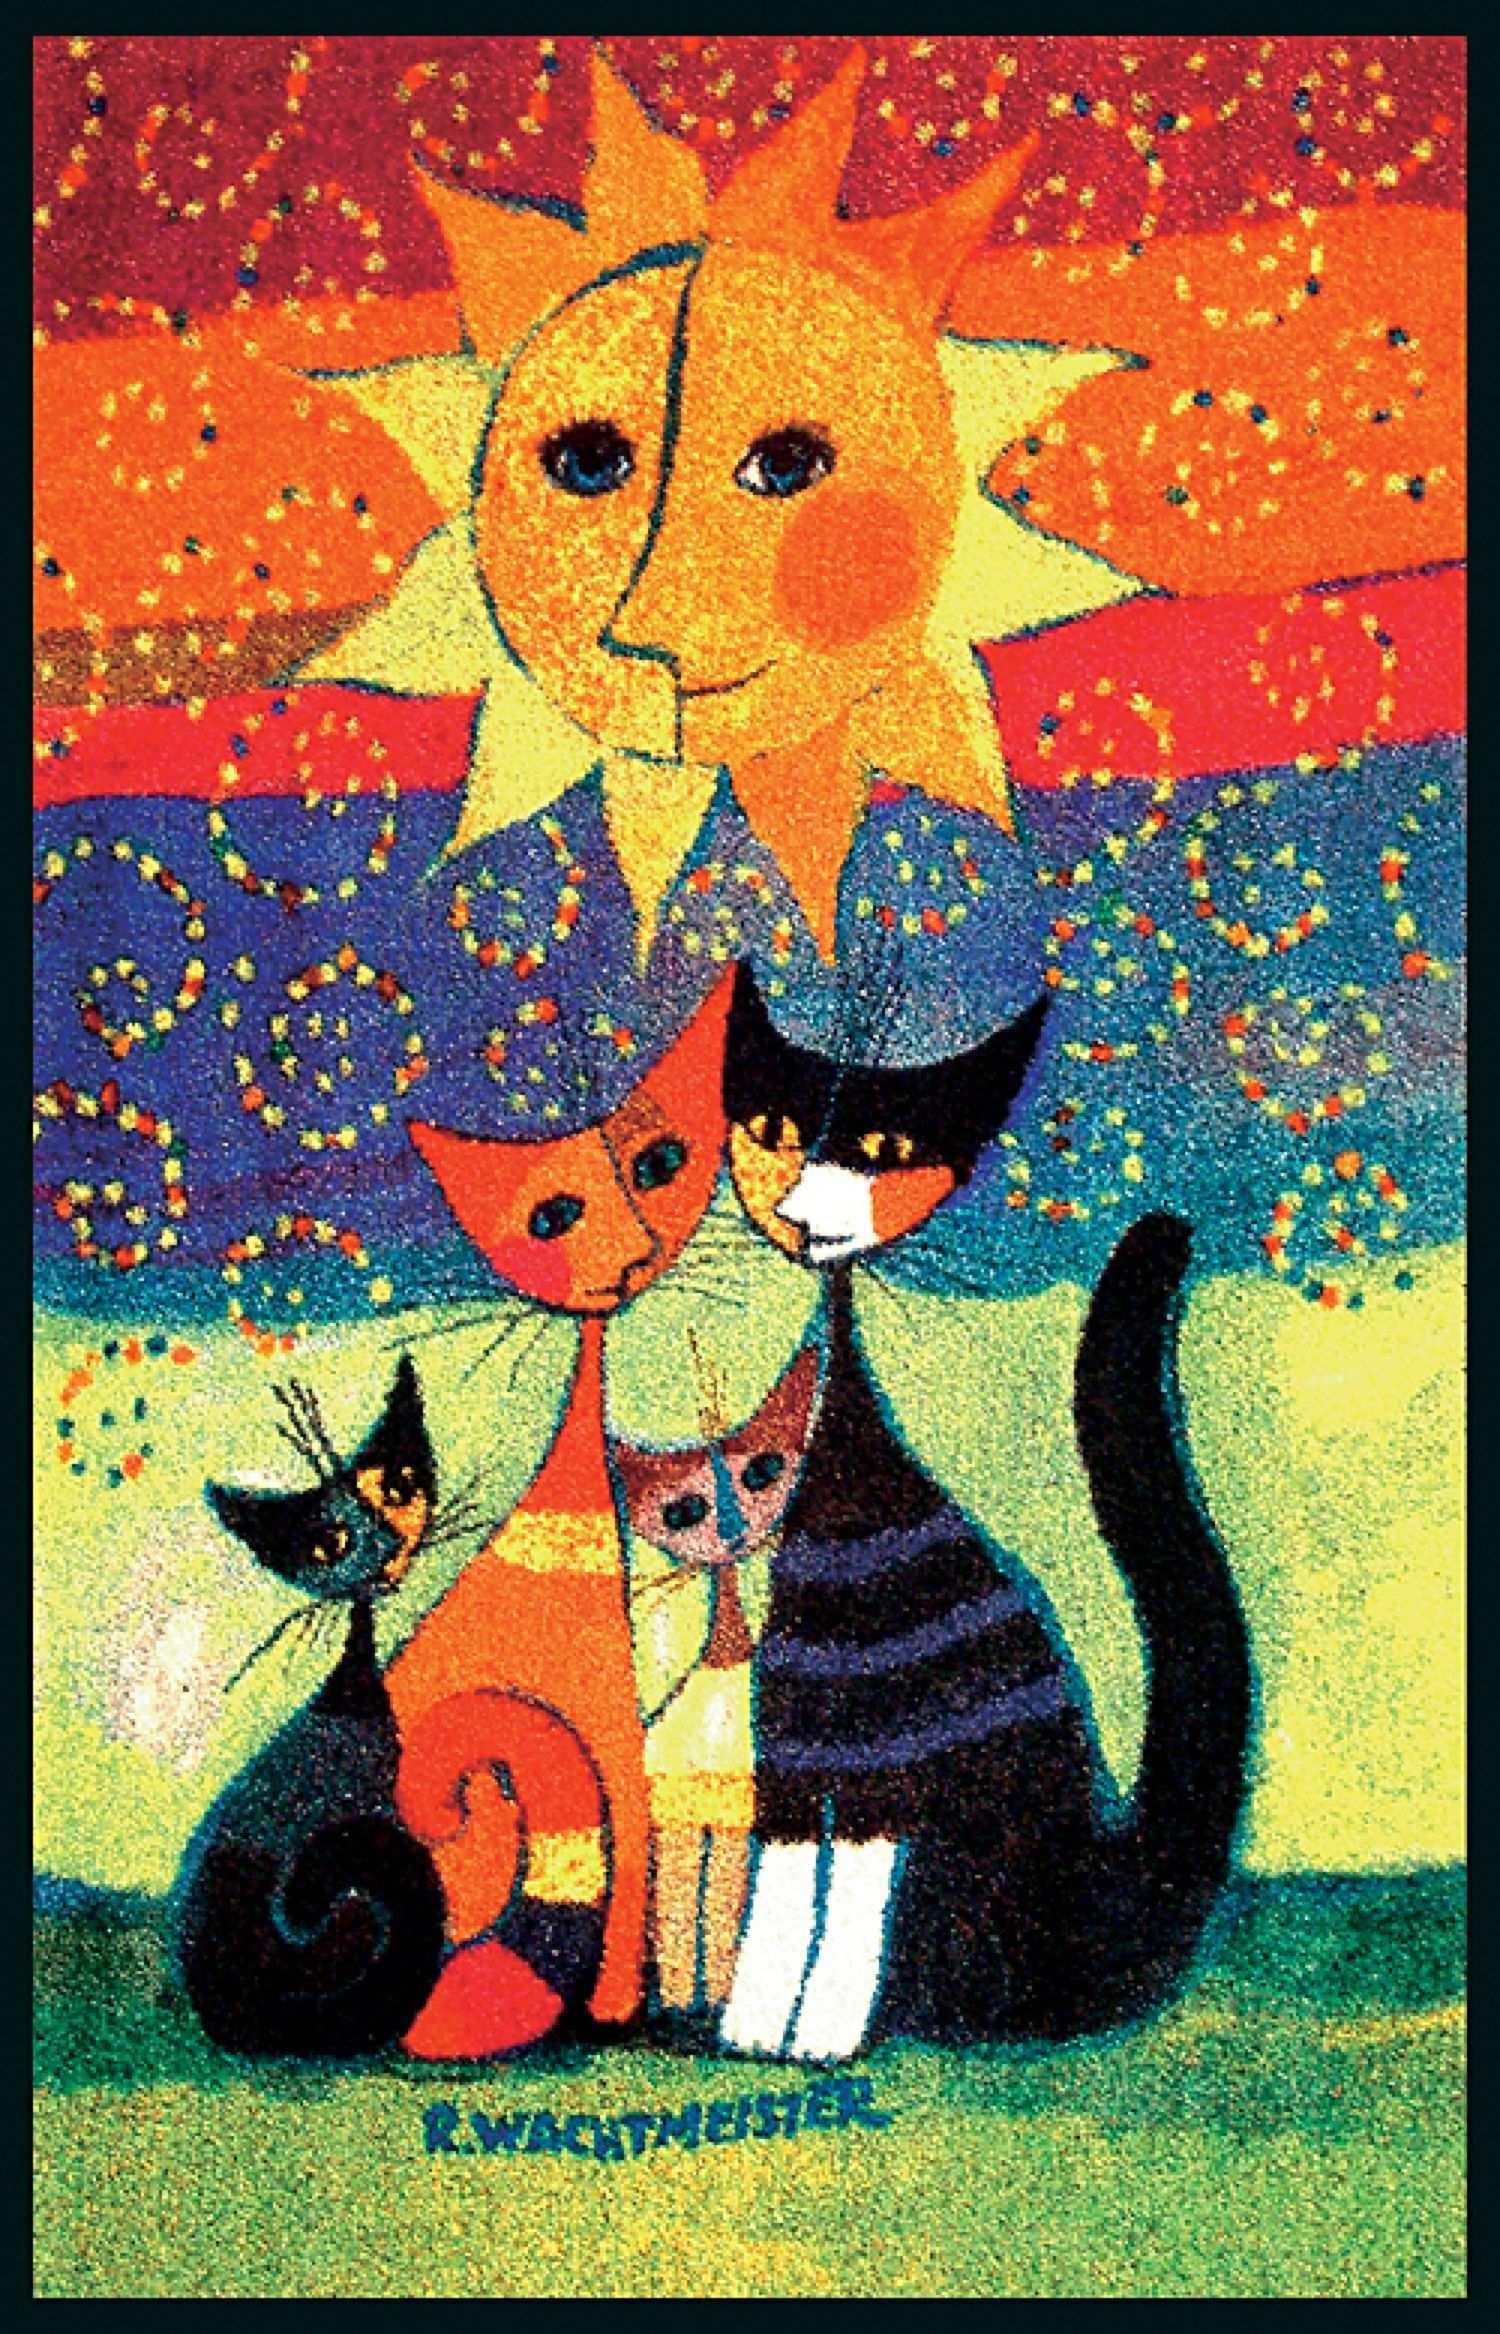 Fussmatte Momenti Rosina Wachtmeister Gunstig Lehner Versand Kattenschilderijen Kattenkunst Katten